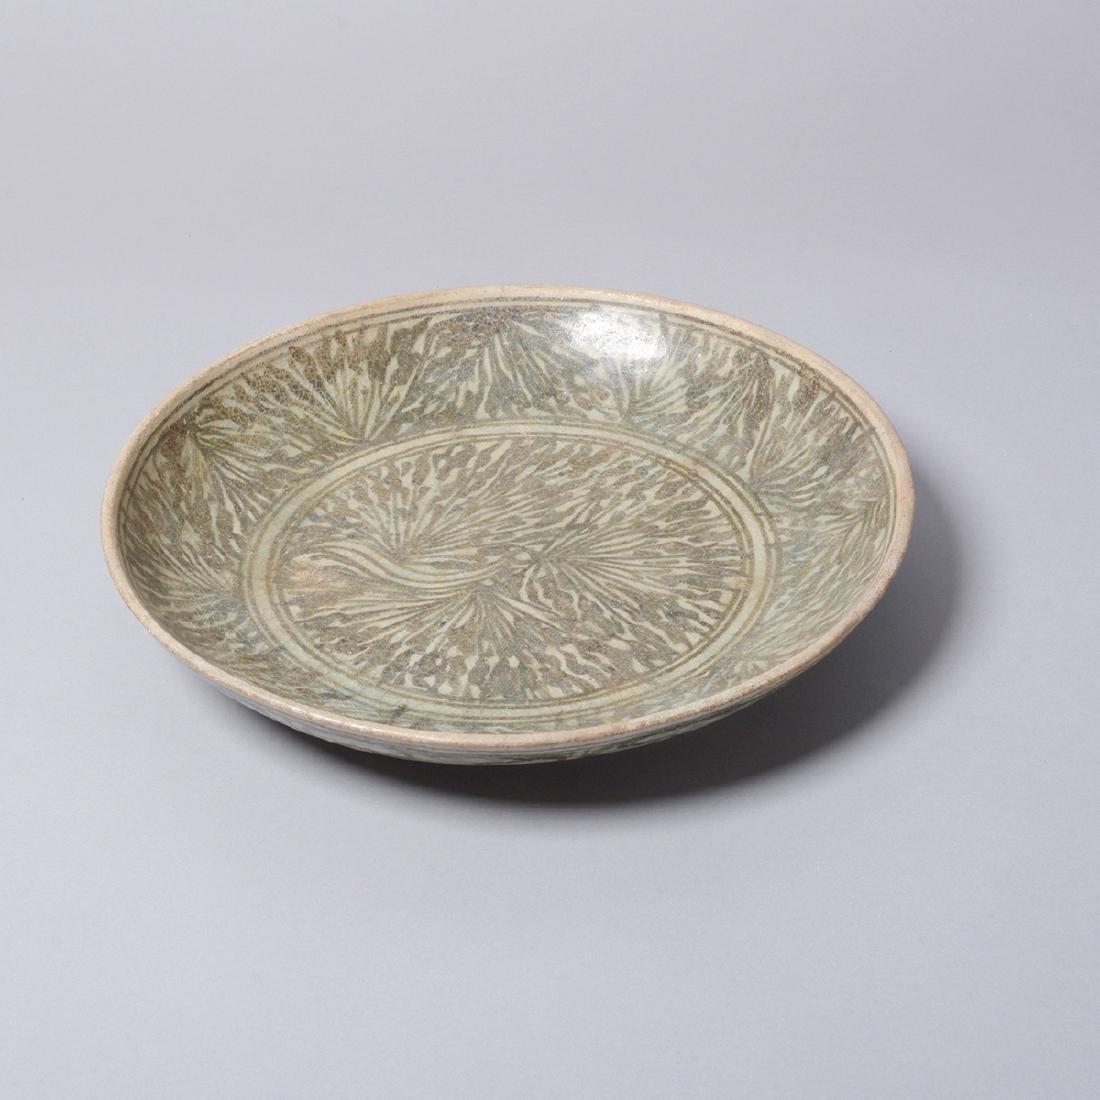 Large Group of Thai Glazed Ceramics, 7th - 16th C - 6